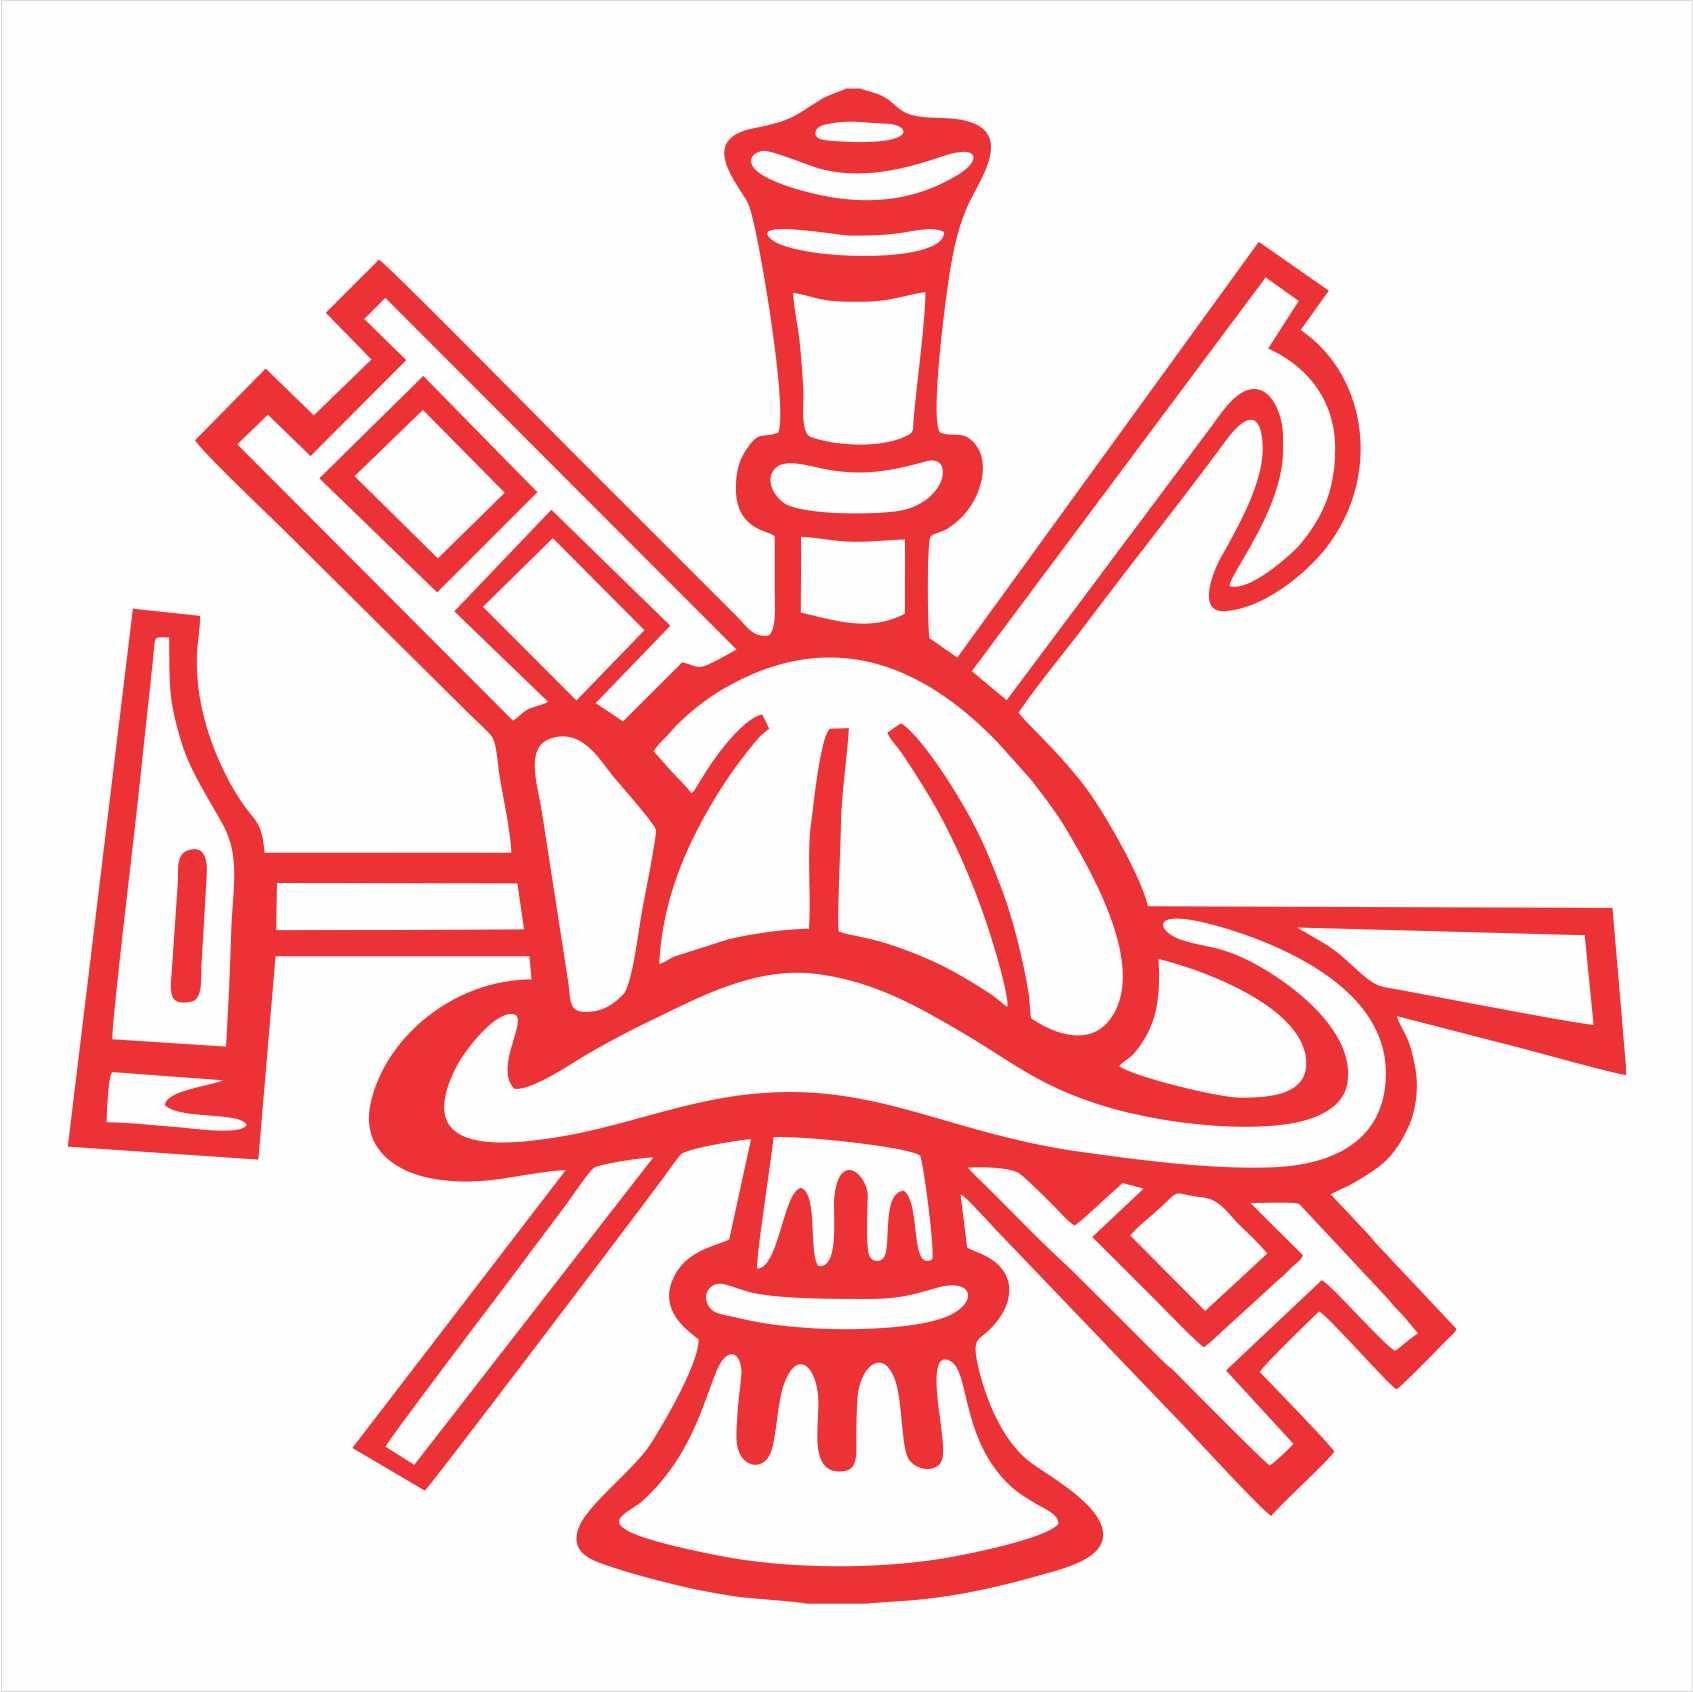 """Firefighter Logo"" Firefighter/EMT themed design can be"